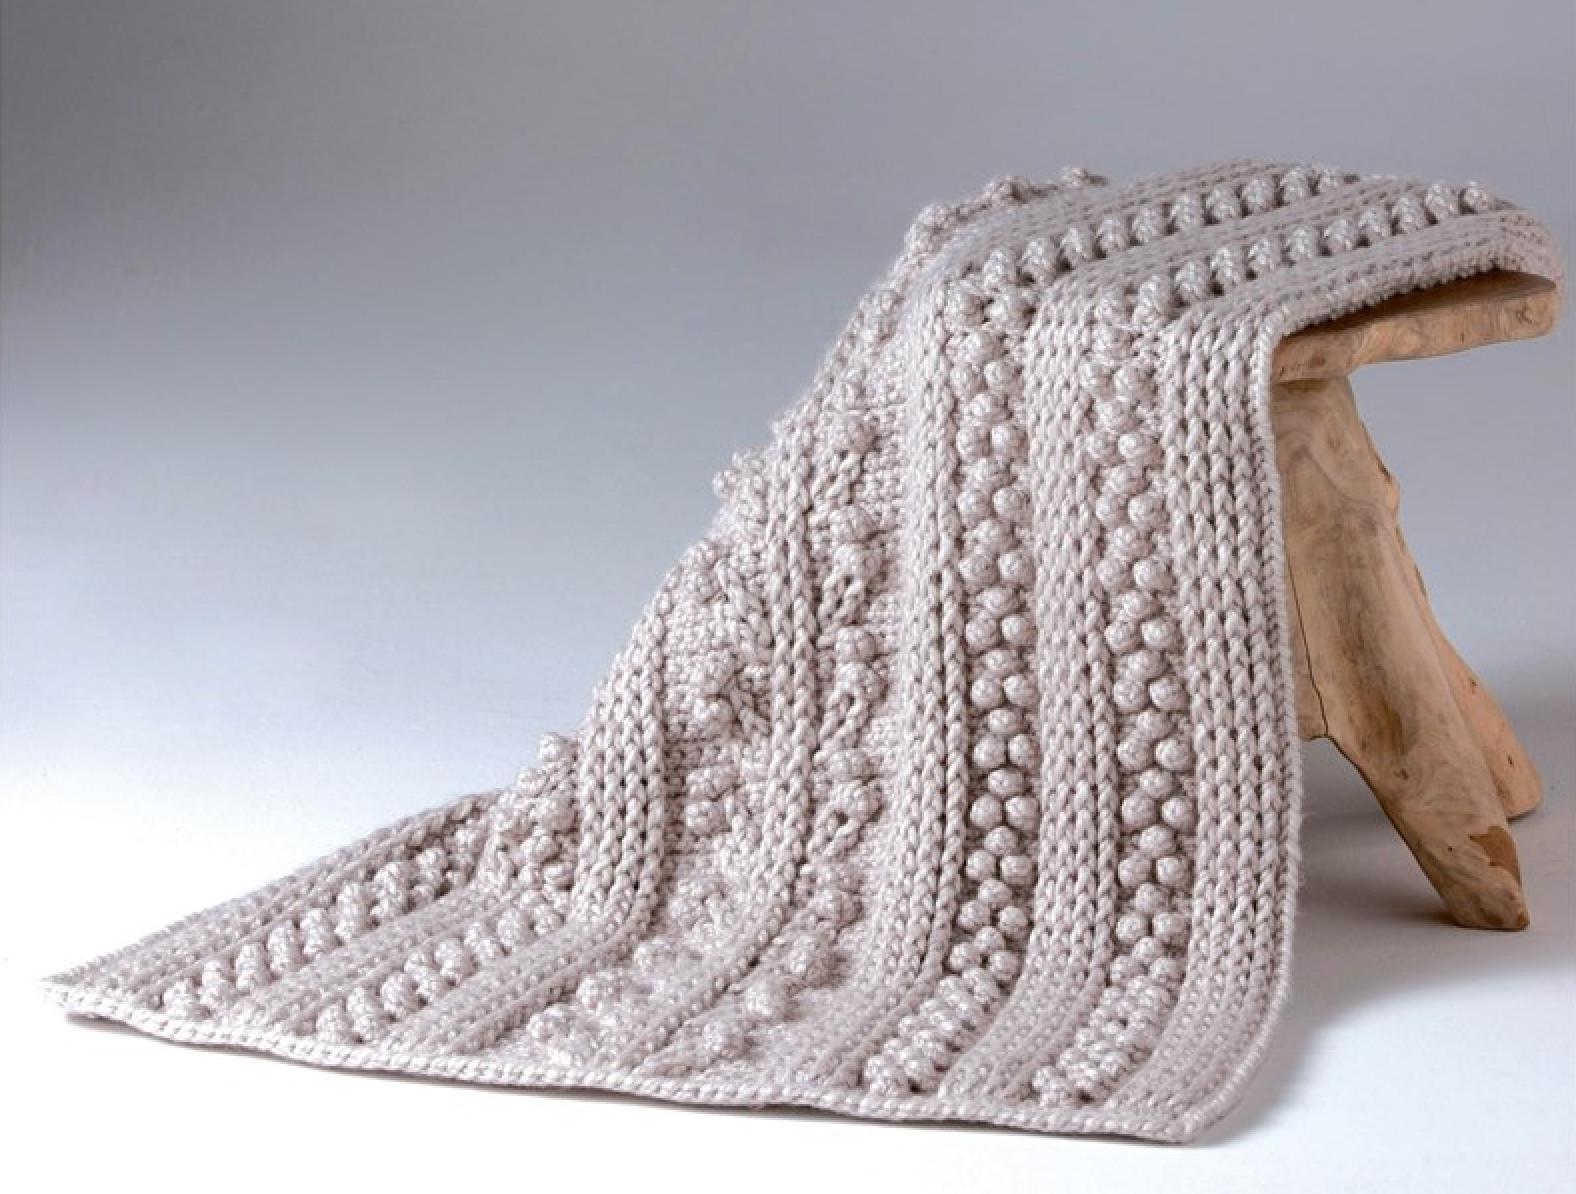 Breipatroon Plaid Met Kabels.Gratis Haakpatroon Kabeldeken Crochet Blankets Haken